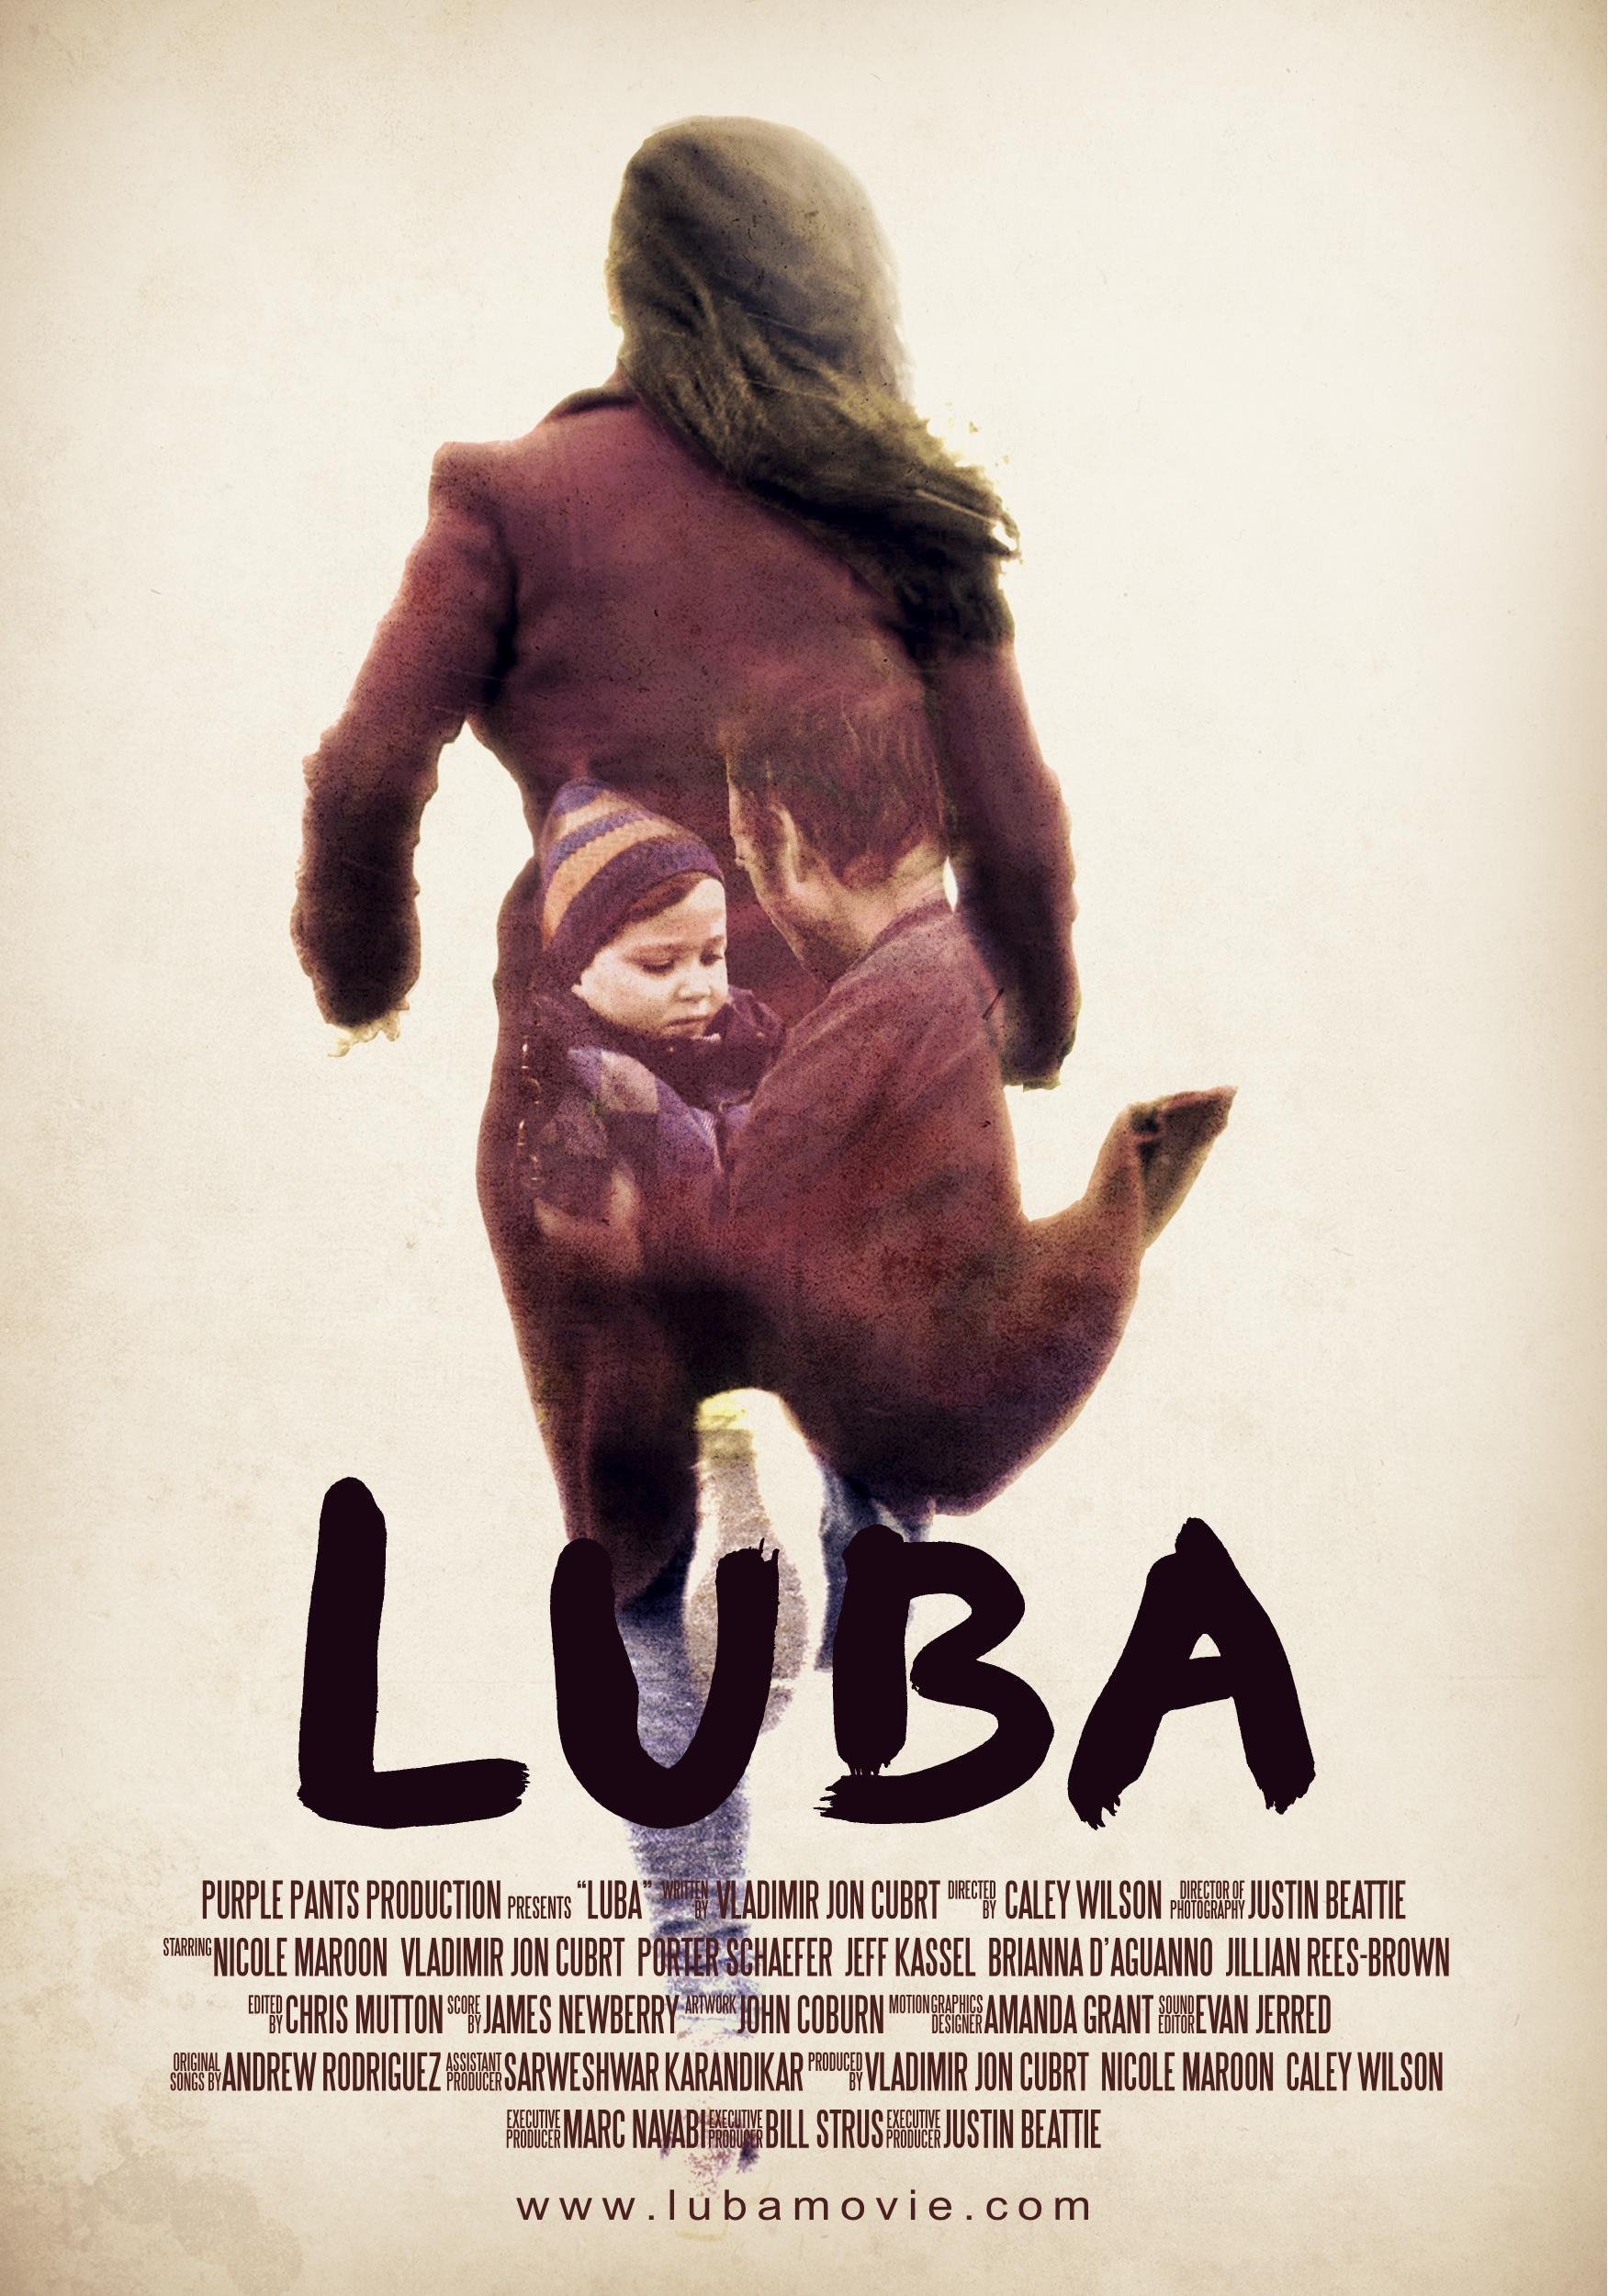 Luba | Caley Wilson, Director